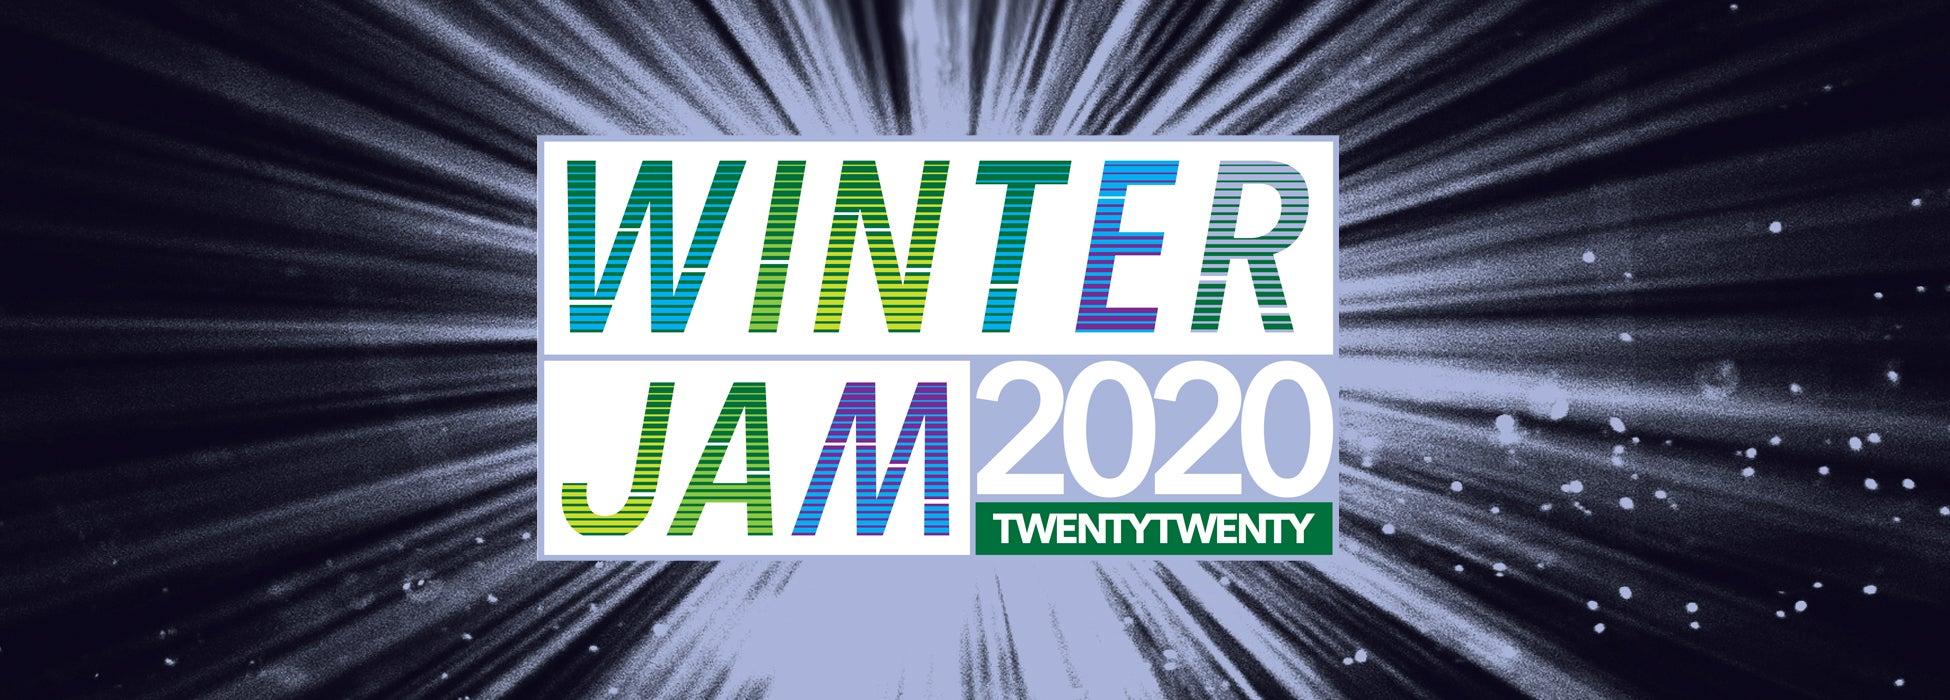 Avenged Sevenfold Tour 2020.Winter Jam 2020 Chartway Arena Norfolk Virginia